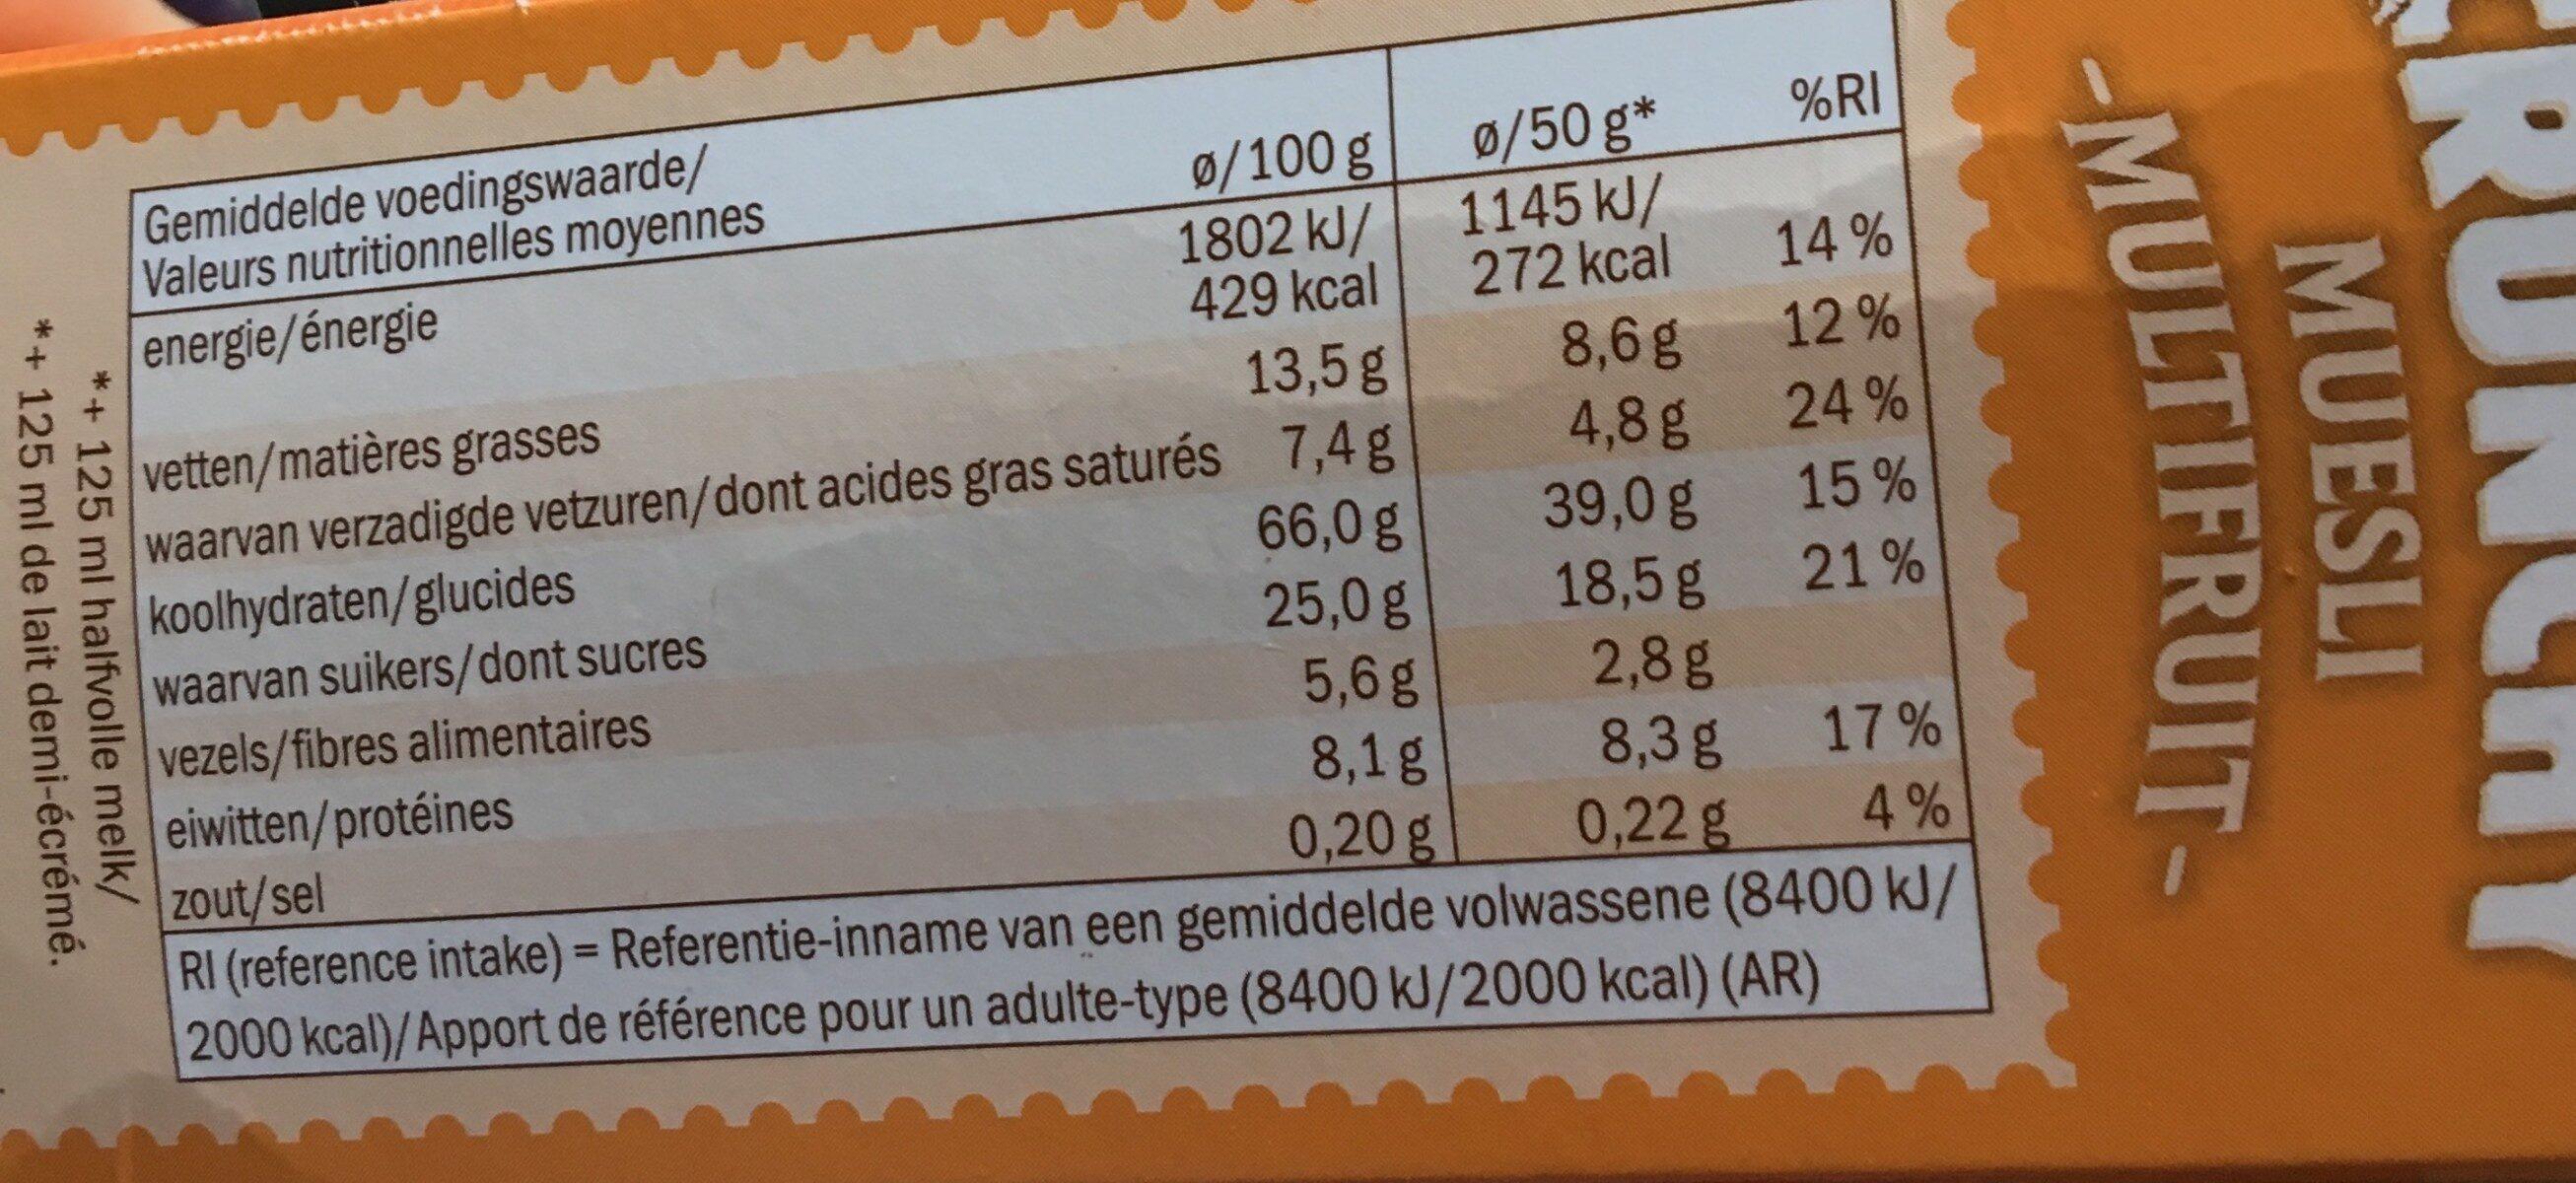 Crunchy - Muesli croustillant multifruit - Voedingswaarden - fr